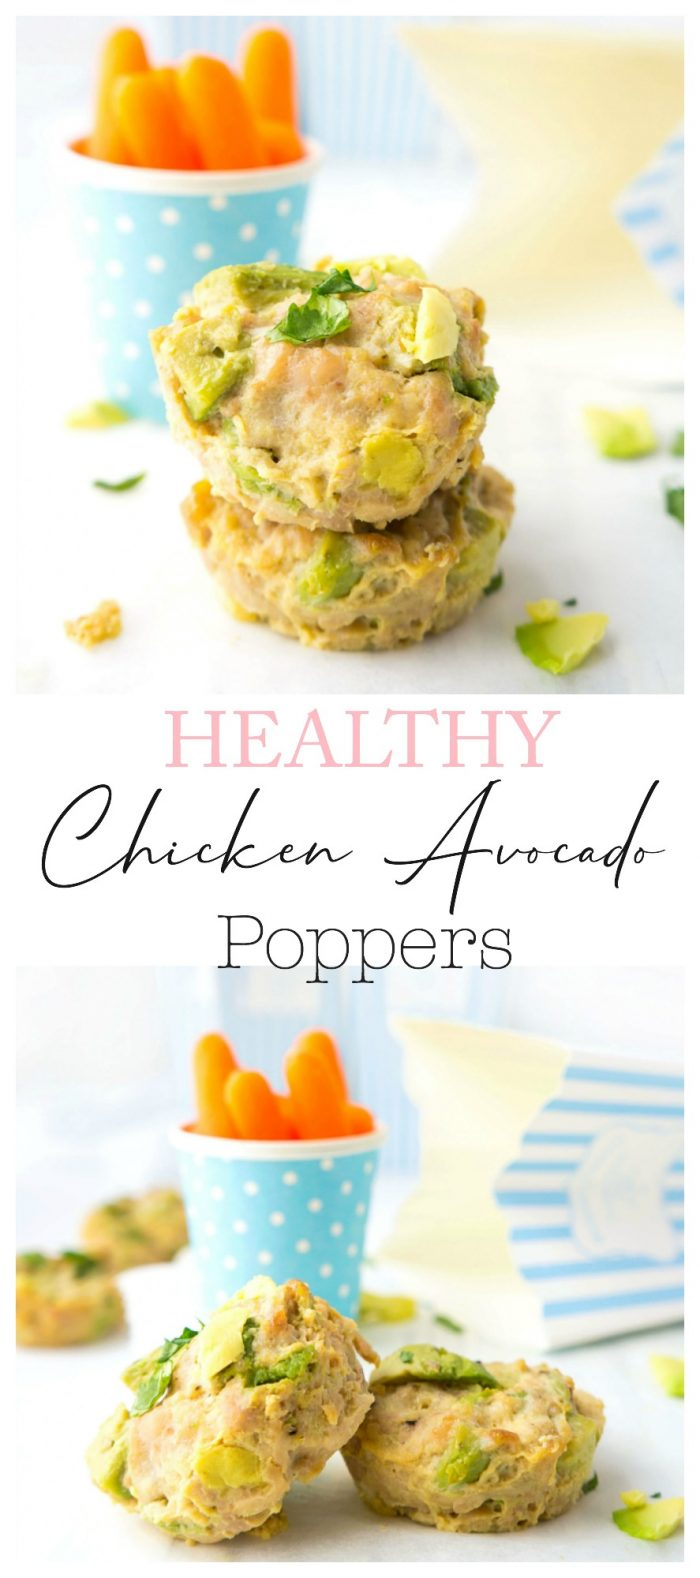 Chicken Avocado Poppers